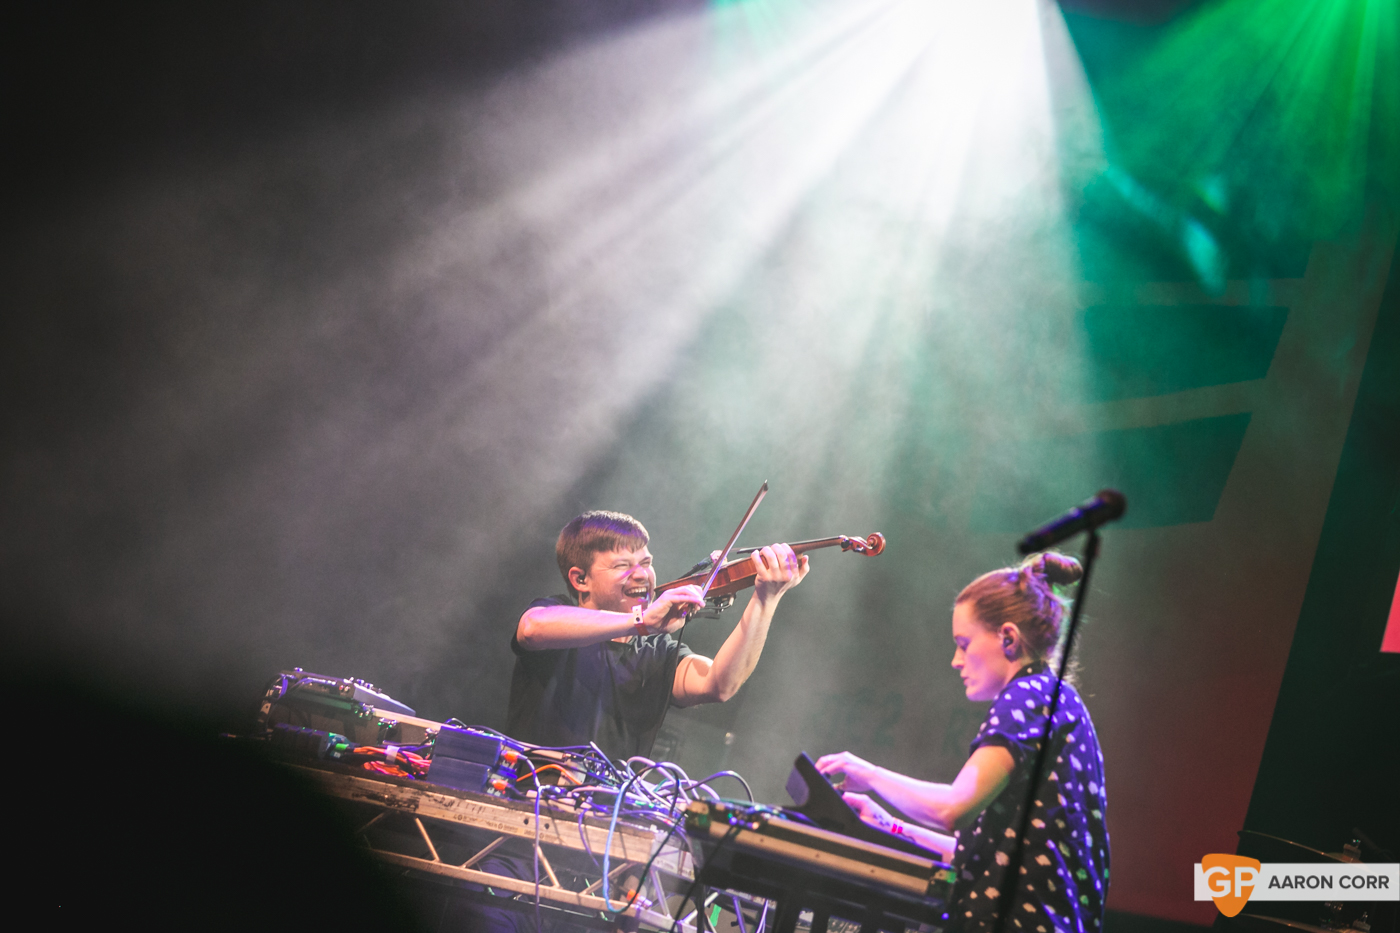 Daithi at Choice Music Prize 2020 in Vicar Street, Dublin on 05-Mar-20 by Aaron Corr-5411